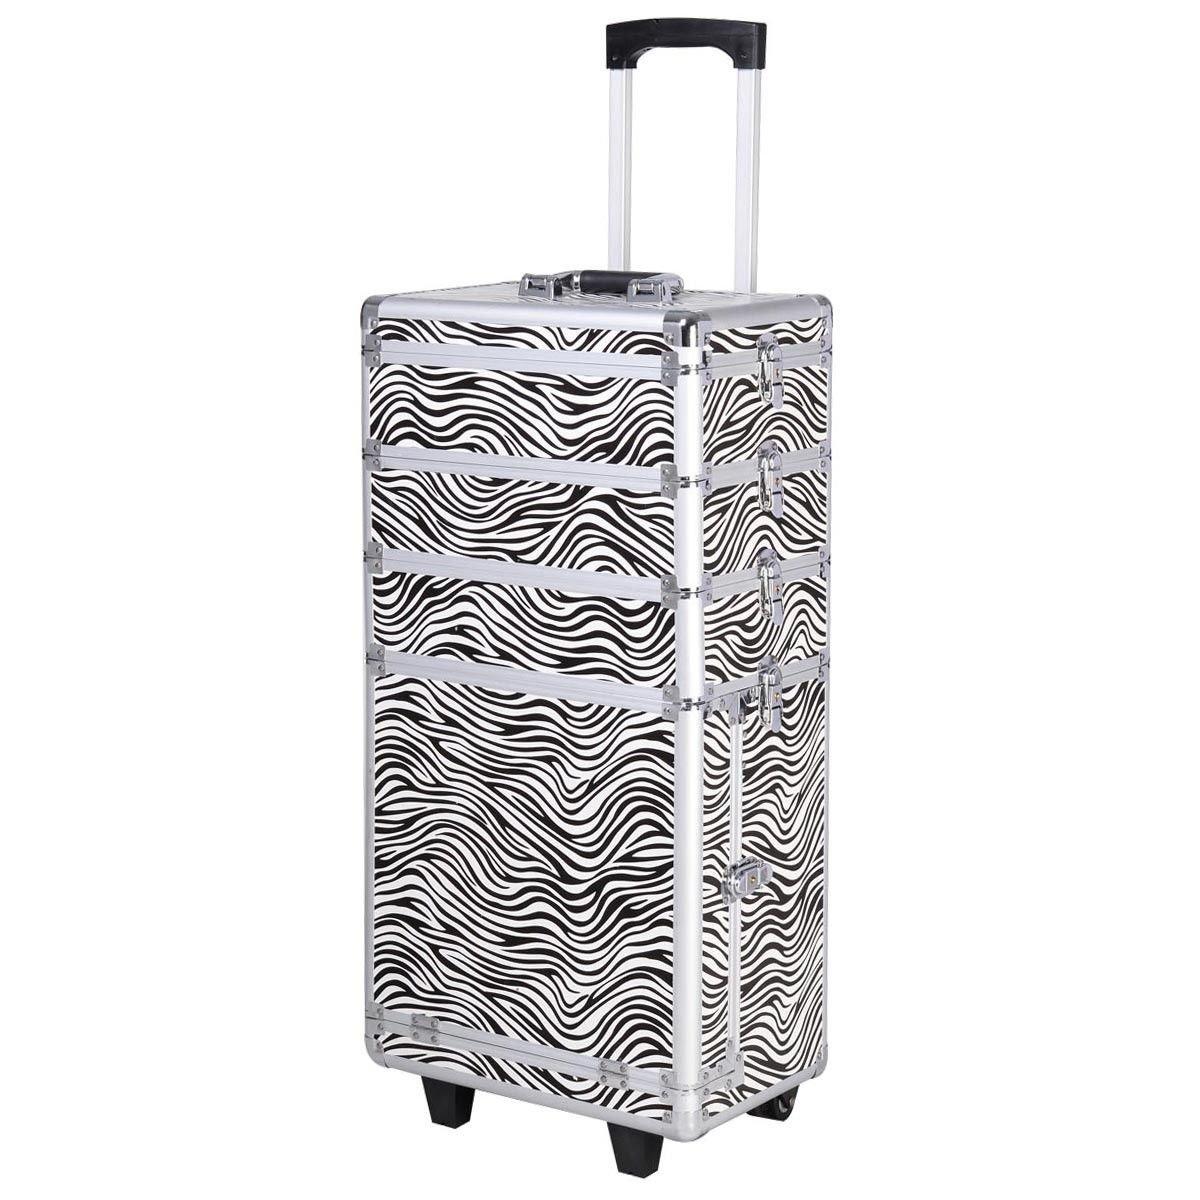 Comie 4 in 1 Pro Aluminum Rolling Makeup Case Salon Cosmetic Box Organizer Trolley Train Case Wheeled Artist Travel